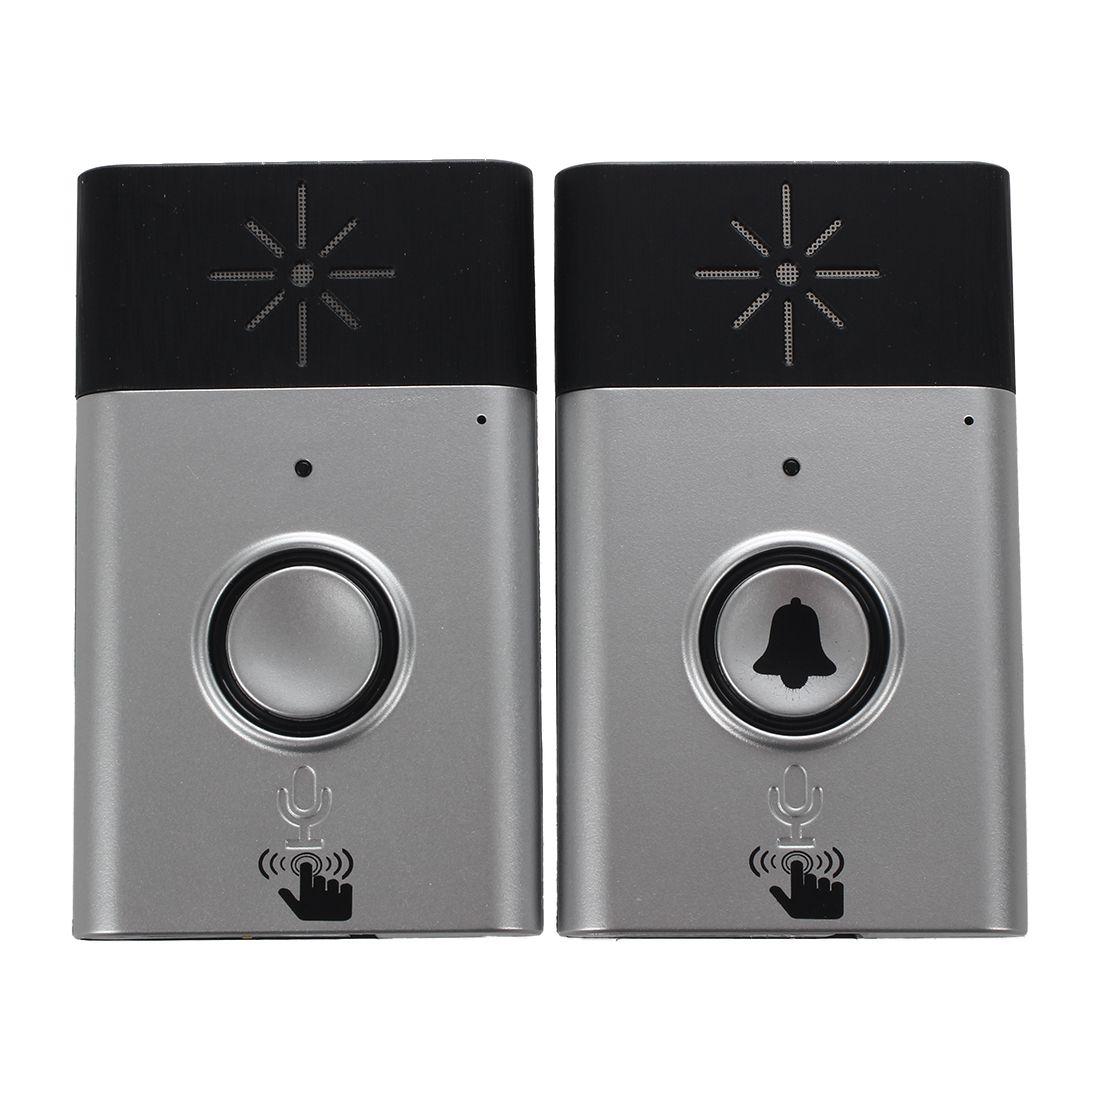 Wireless Doorbell With Speaker Voice Intercom 300M Distance wireless doorbell with speaker voice intercom 300m distance silver glod